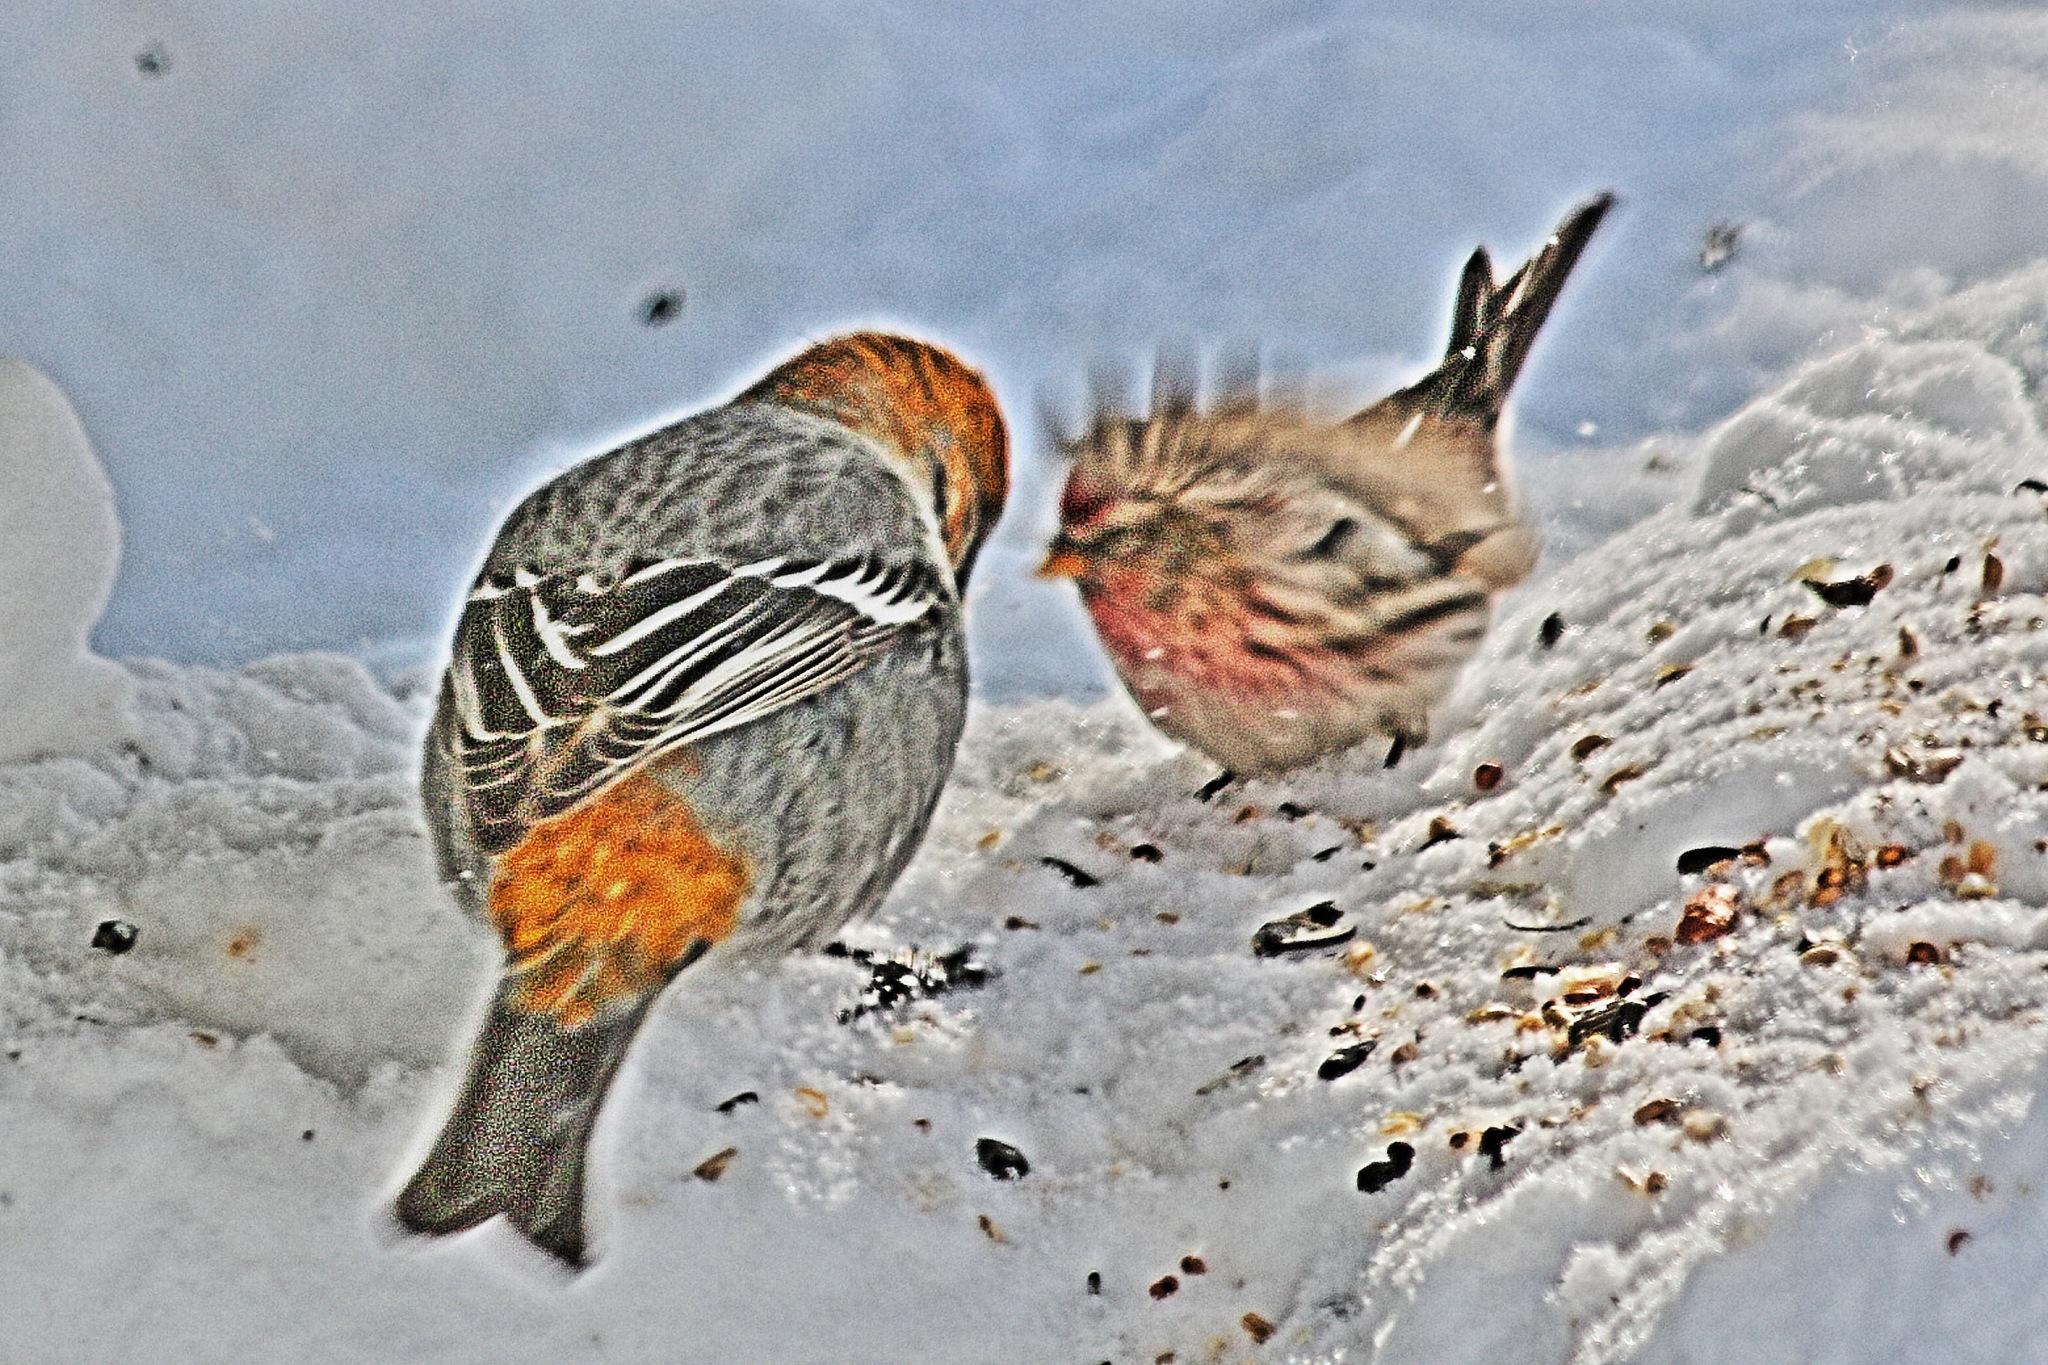 King Bird by Connie Kerik Holloway